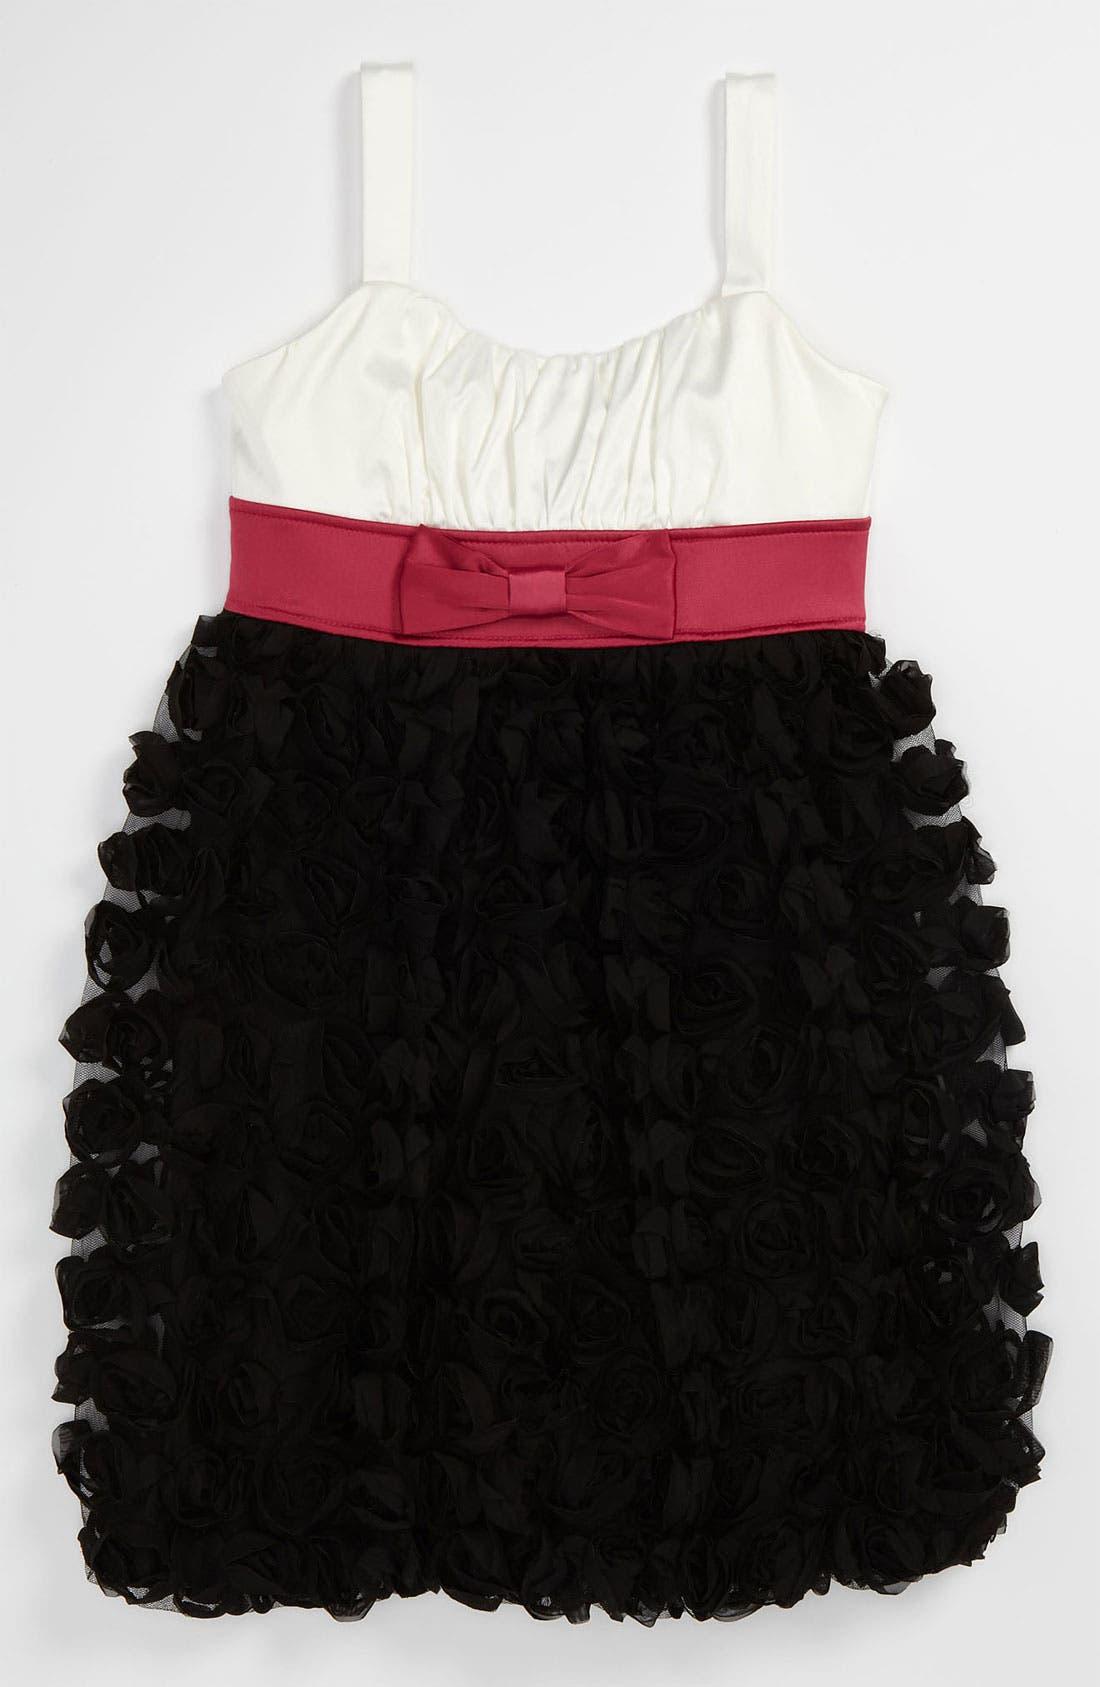 Alternate Image 1 Selected - Roxette Colorblock Dress (Big Girls)